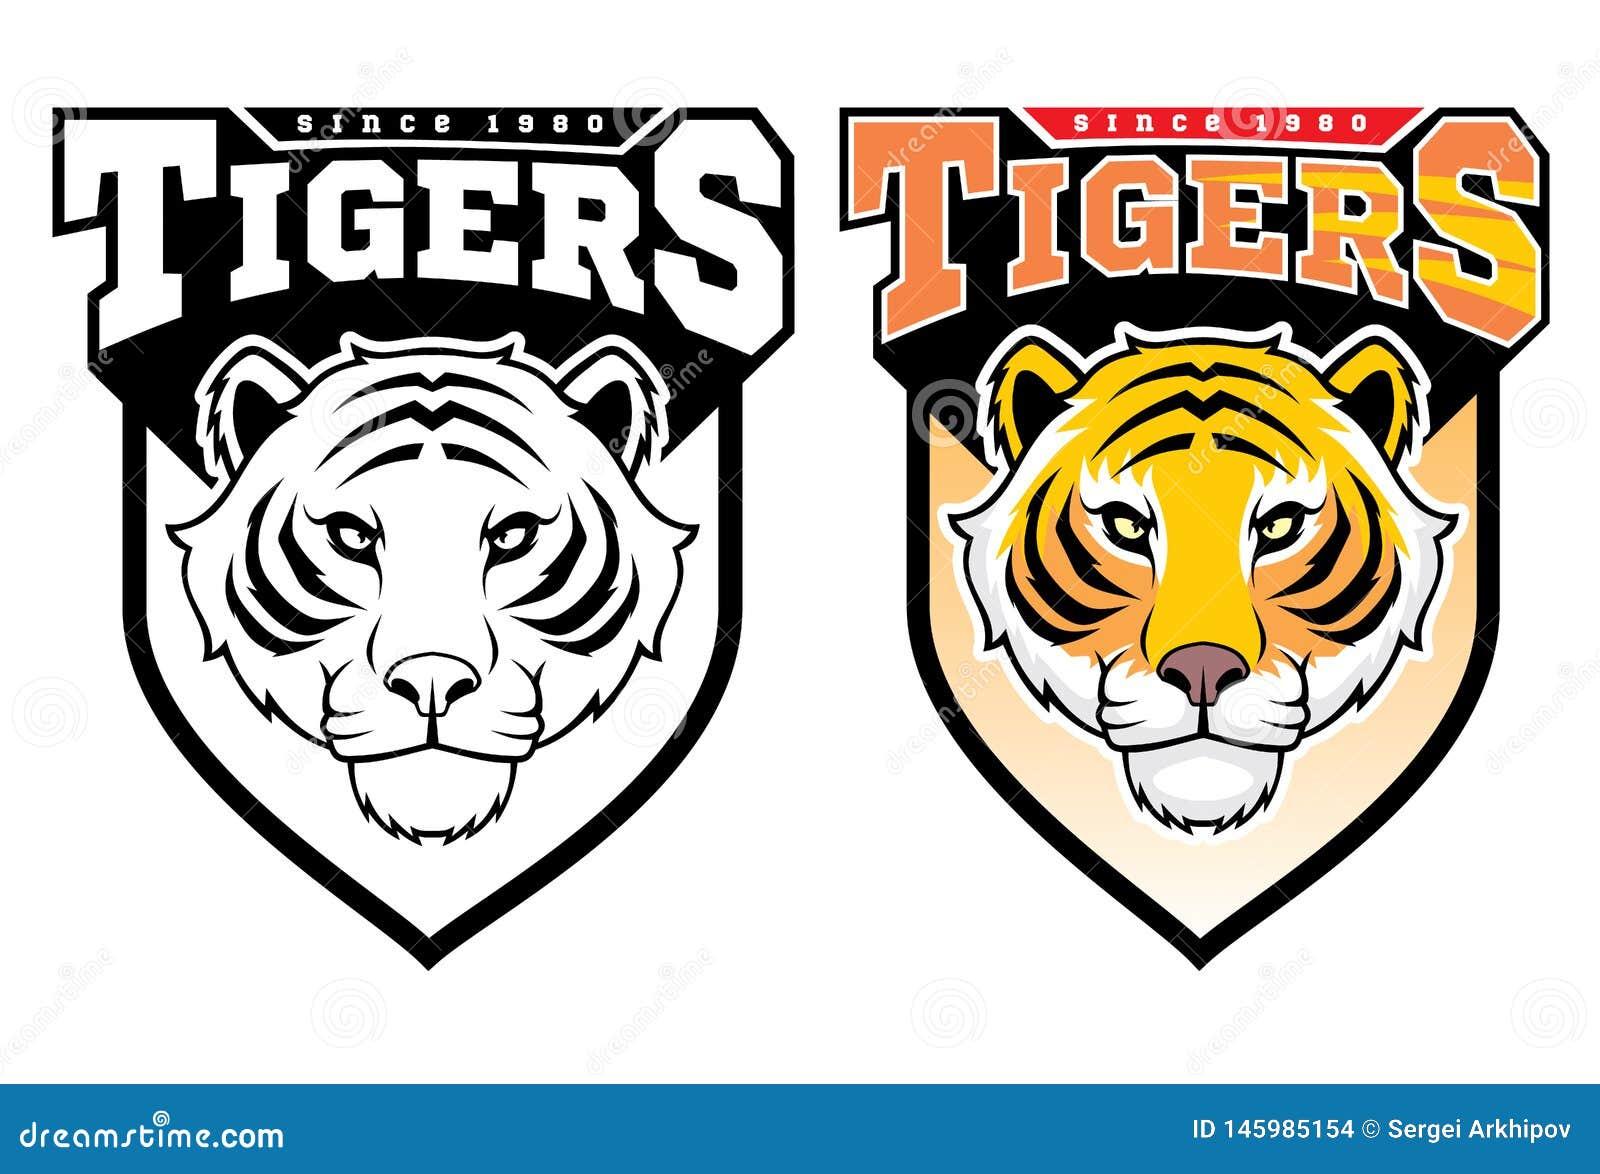 d53c35edd Mascot Tigers. stock vector. Illustration of baseball - 145985154